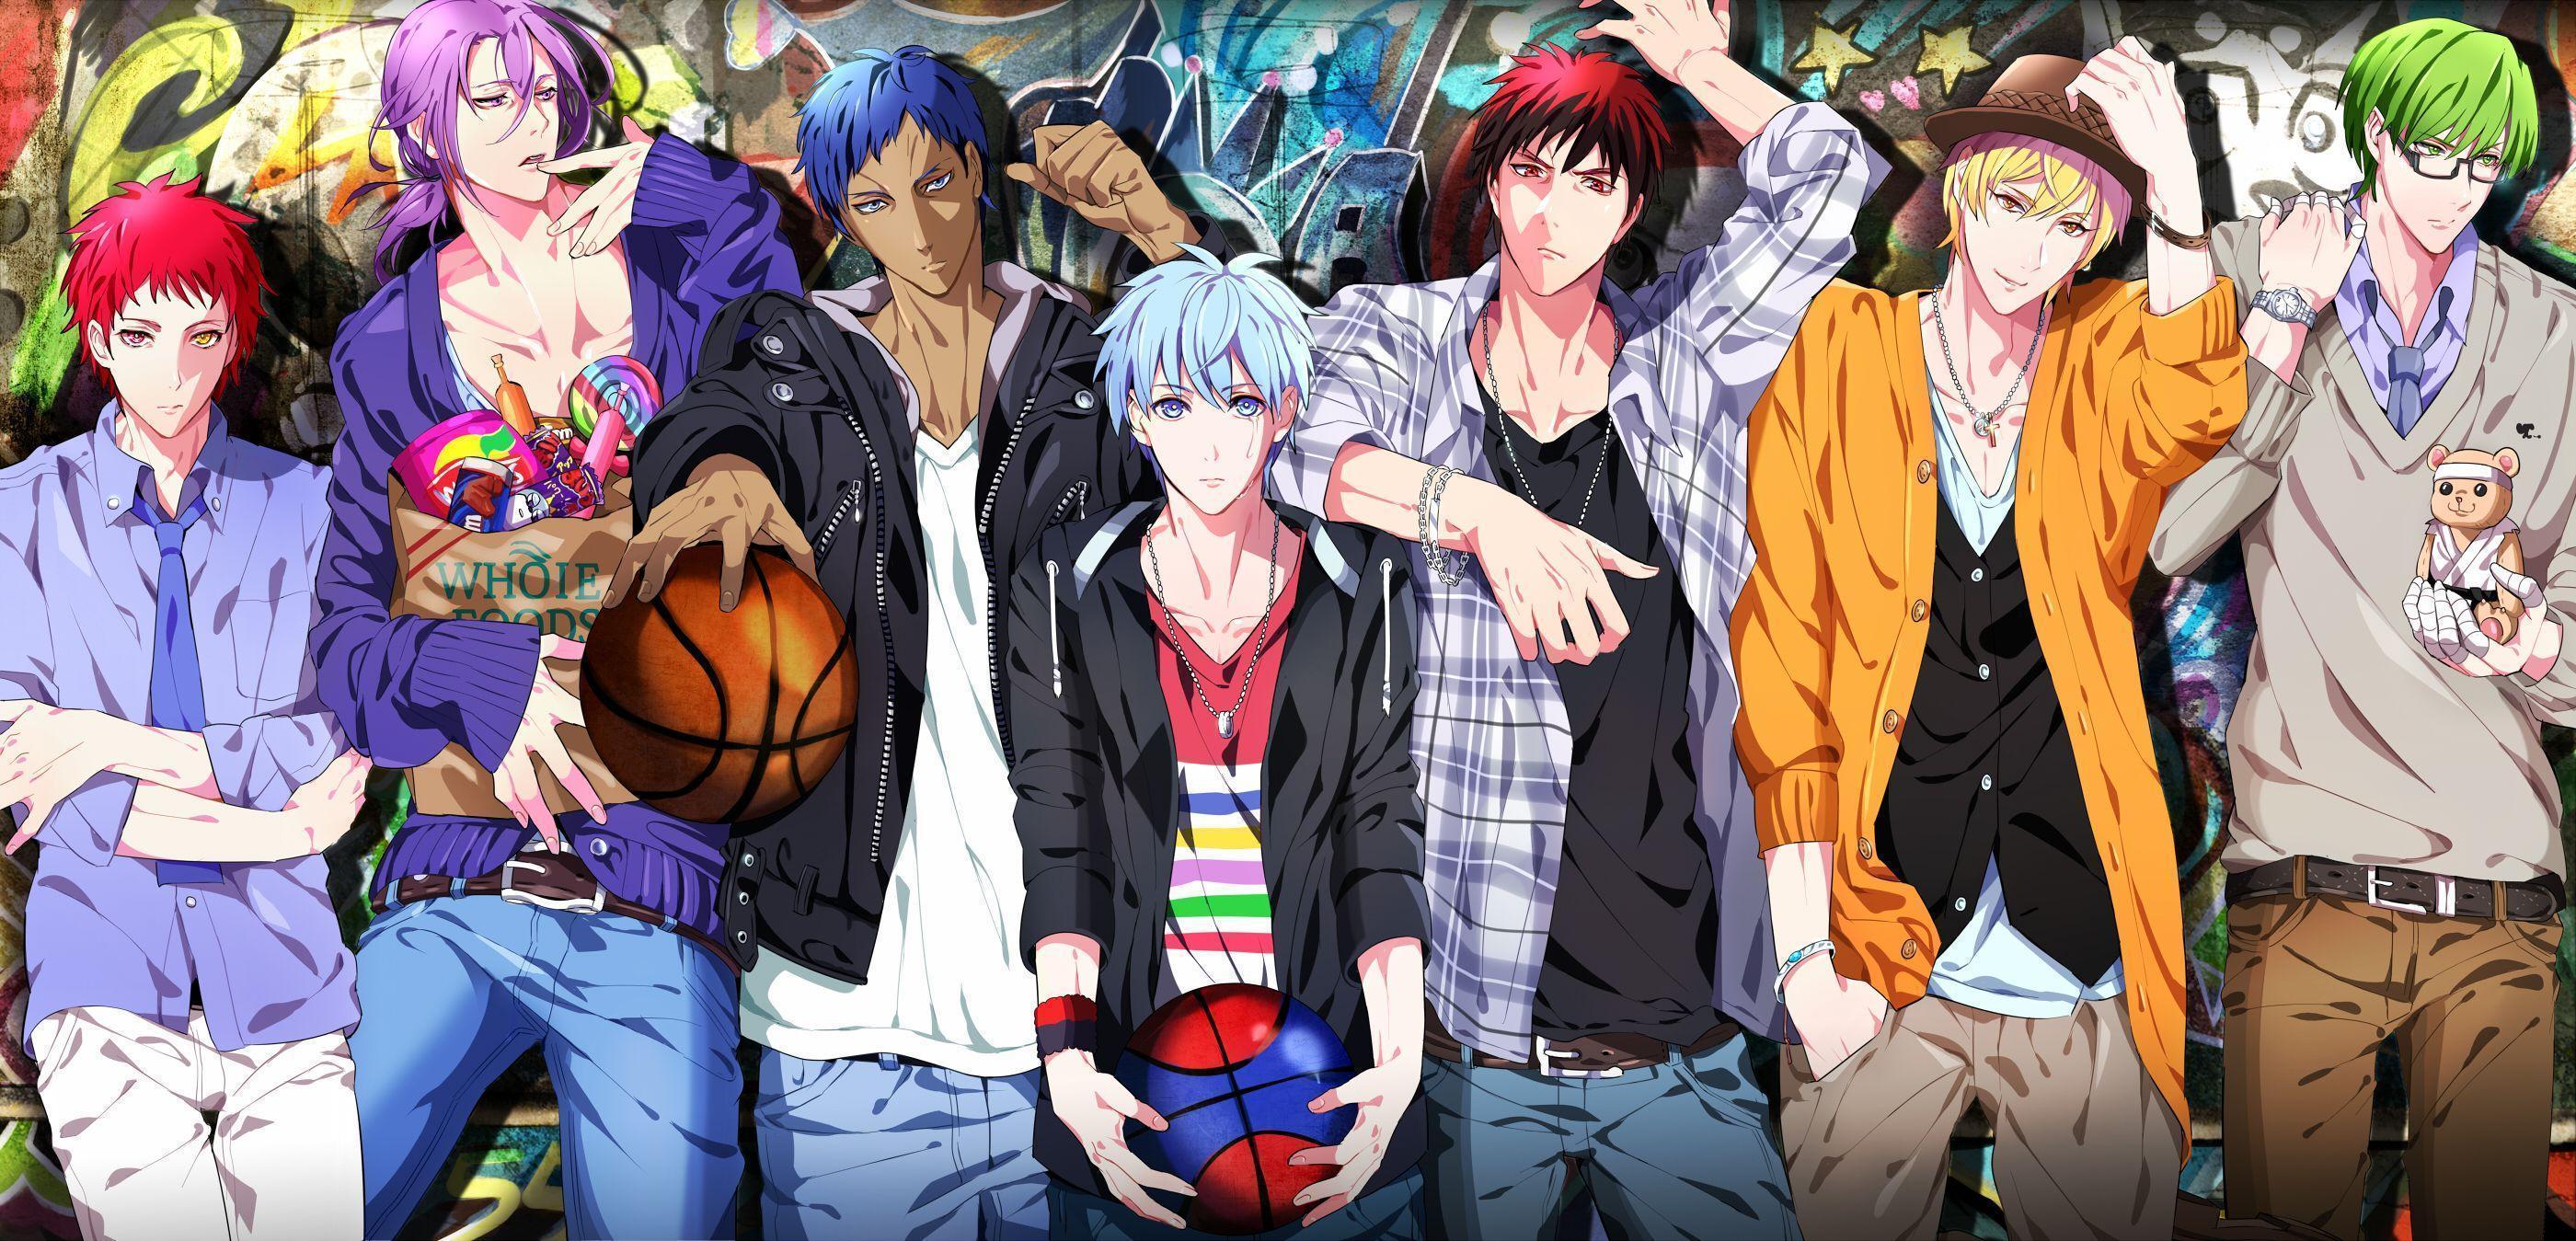 16 Quality Kuroko No Basuke Wallpapers, Anime & Manga